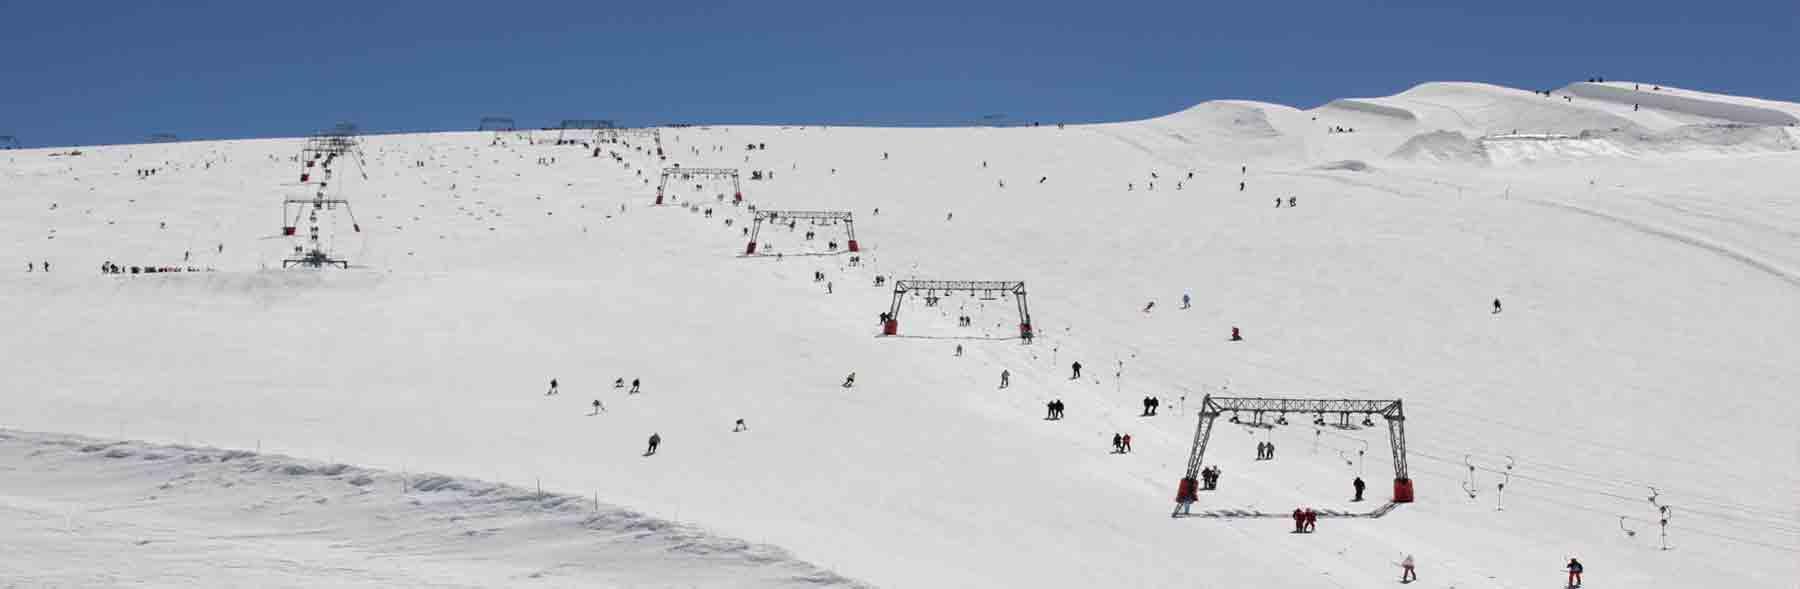 safe_formacion-tecnico_deportivo_nivel_2-esqui_alpino-les_deux_alpes-verano2018-slider